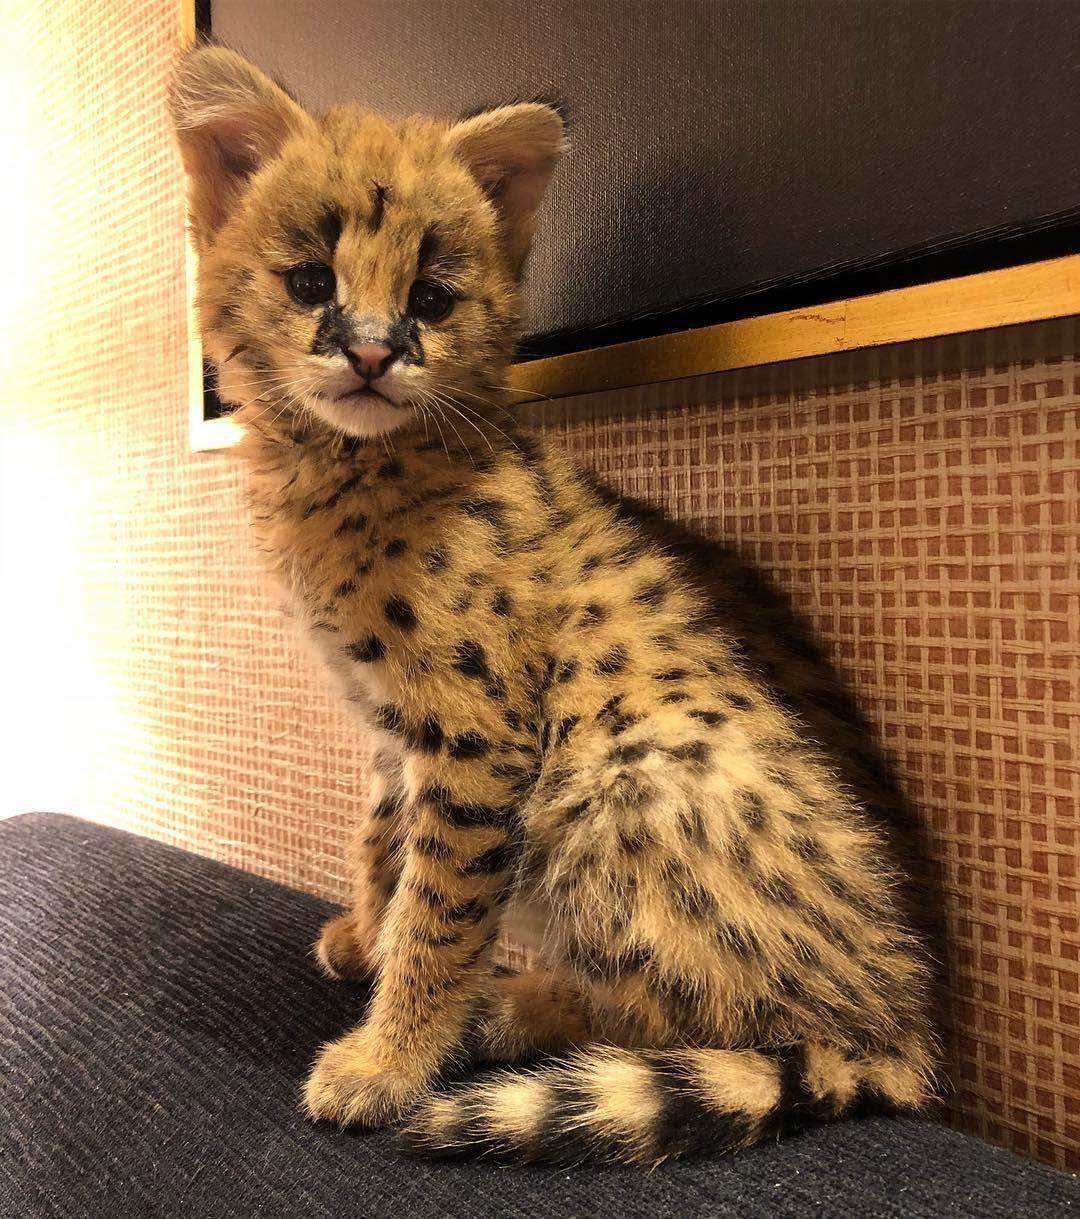 Pin by yo_its dakii on animals Serval kitten, Pretty